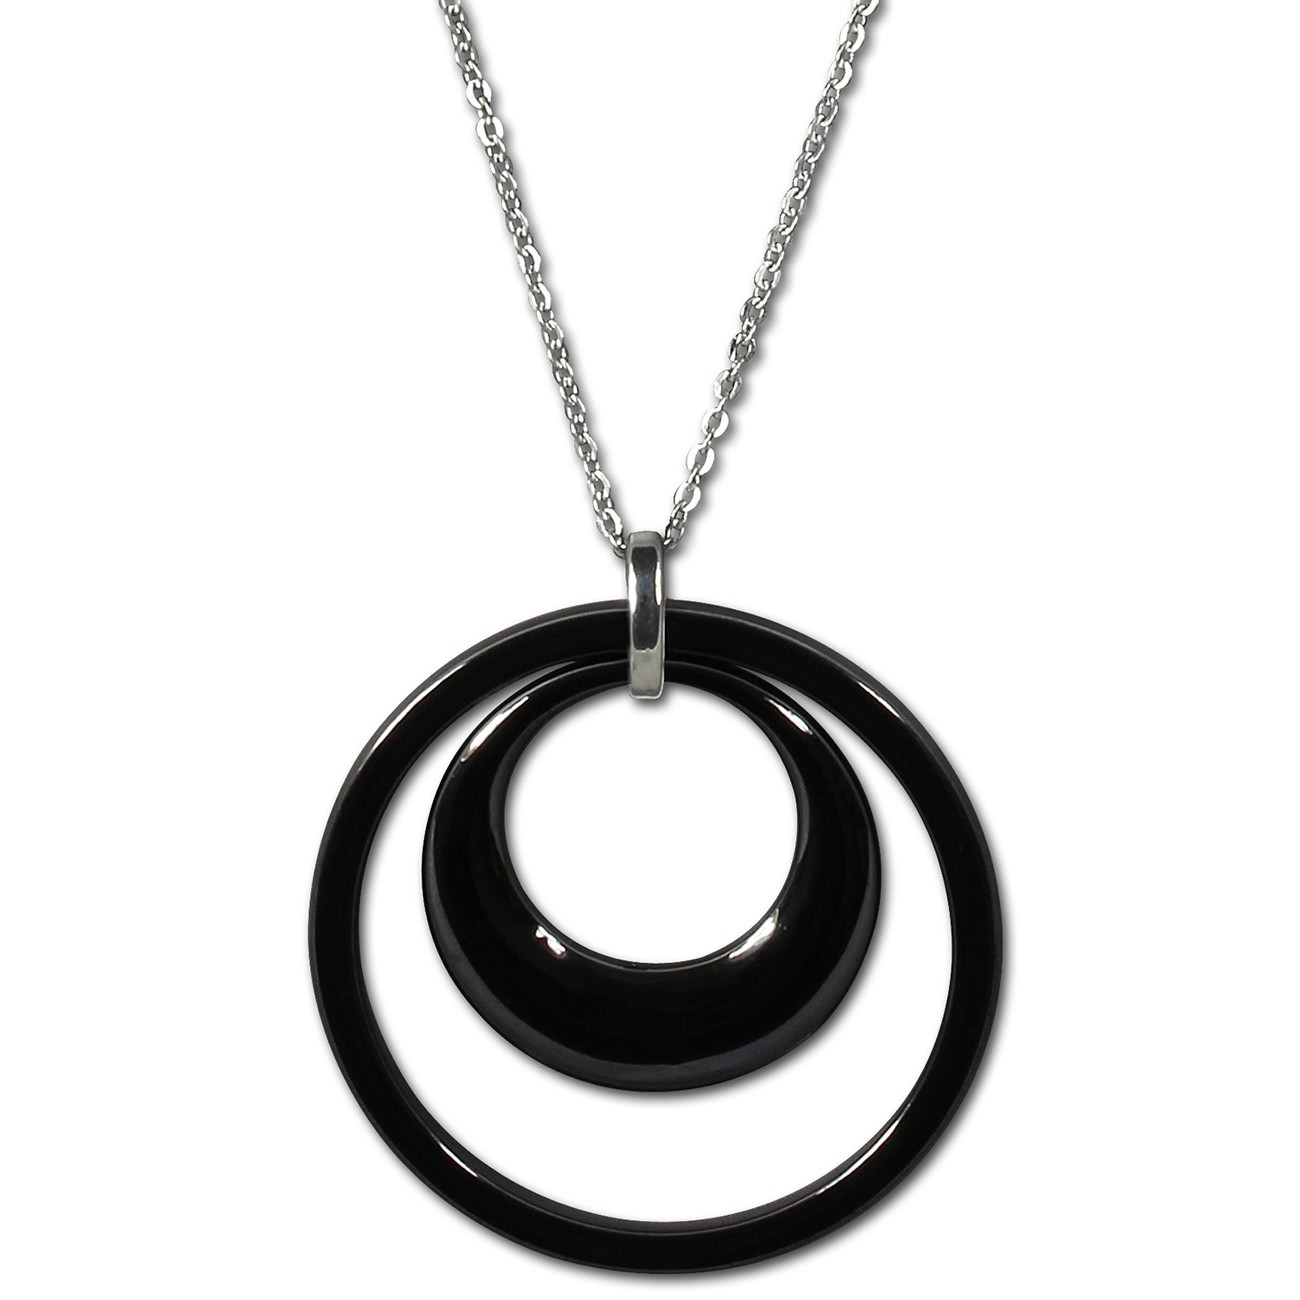 Amello Halskette Keramik Doppel schwarz Damen Edelstahlschmuck ESKX05S